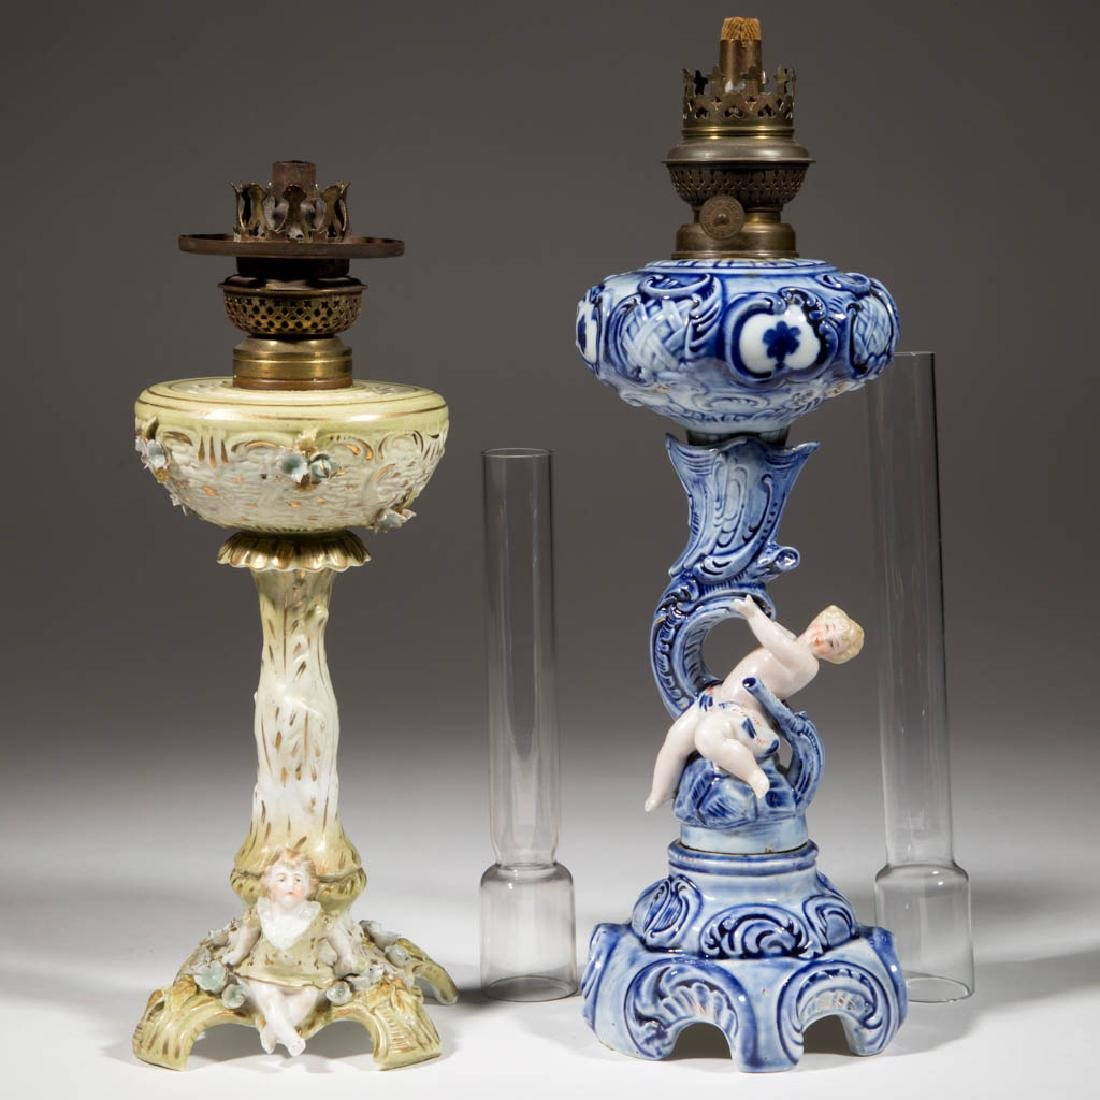 GERMAN PORCELAIN FIGURAL KEROSENE STAND LAMPS, LOT OF